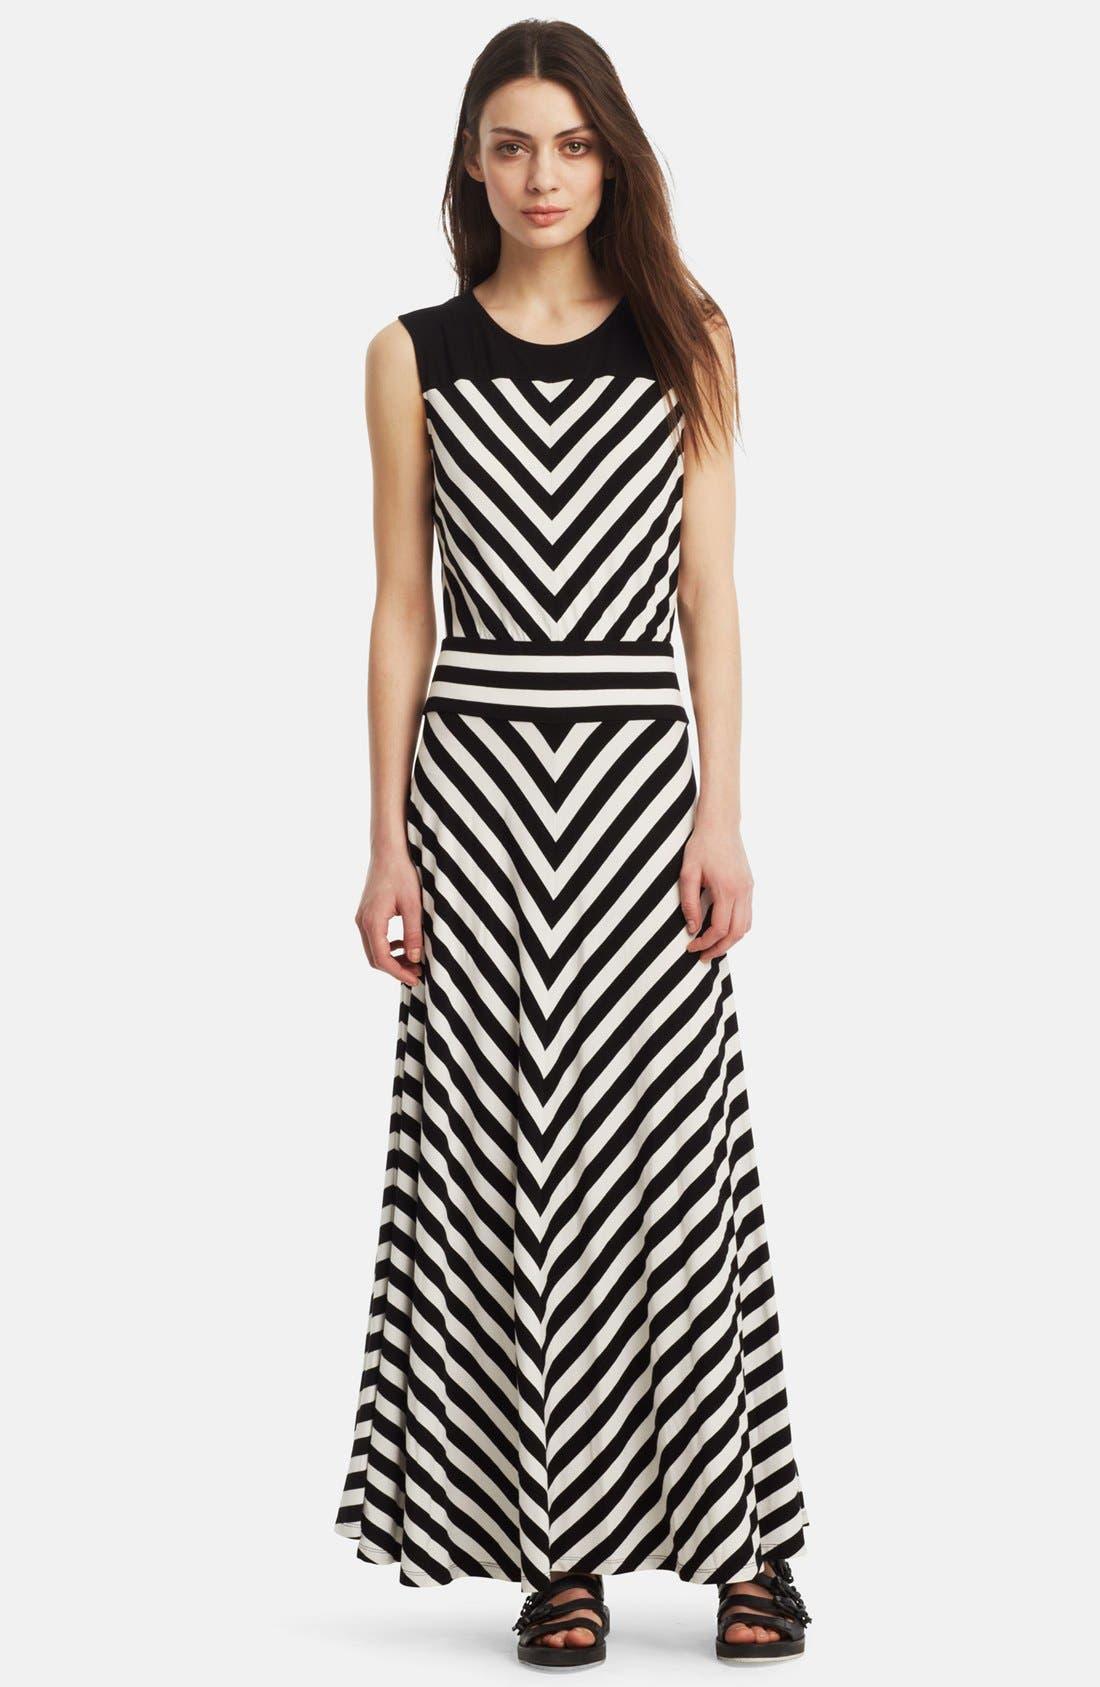 Alternate Image 1 Selected - Kenneth Cole New York 'Harmony' Maxi Dress